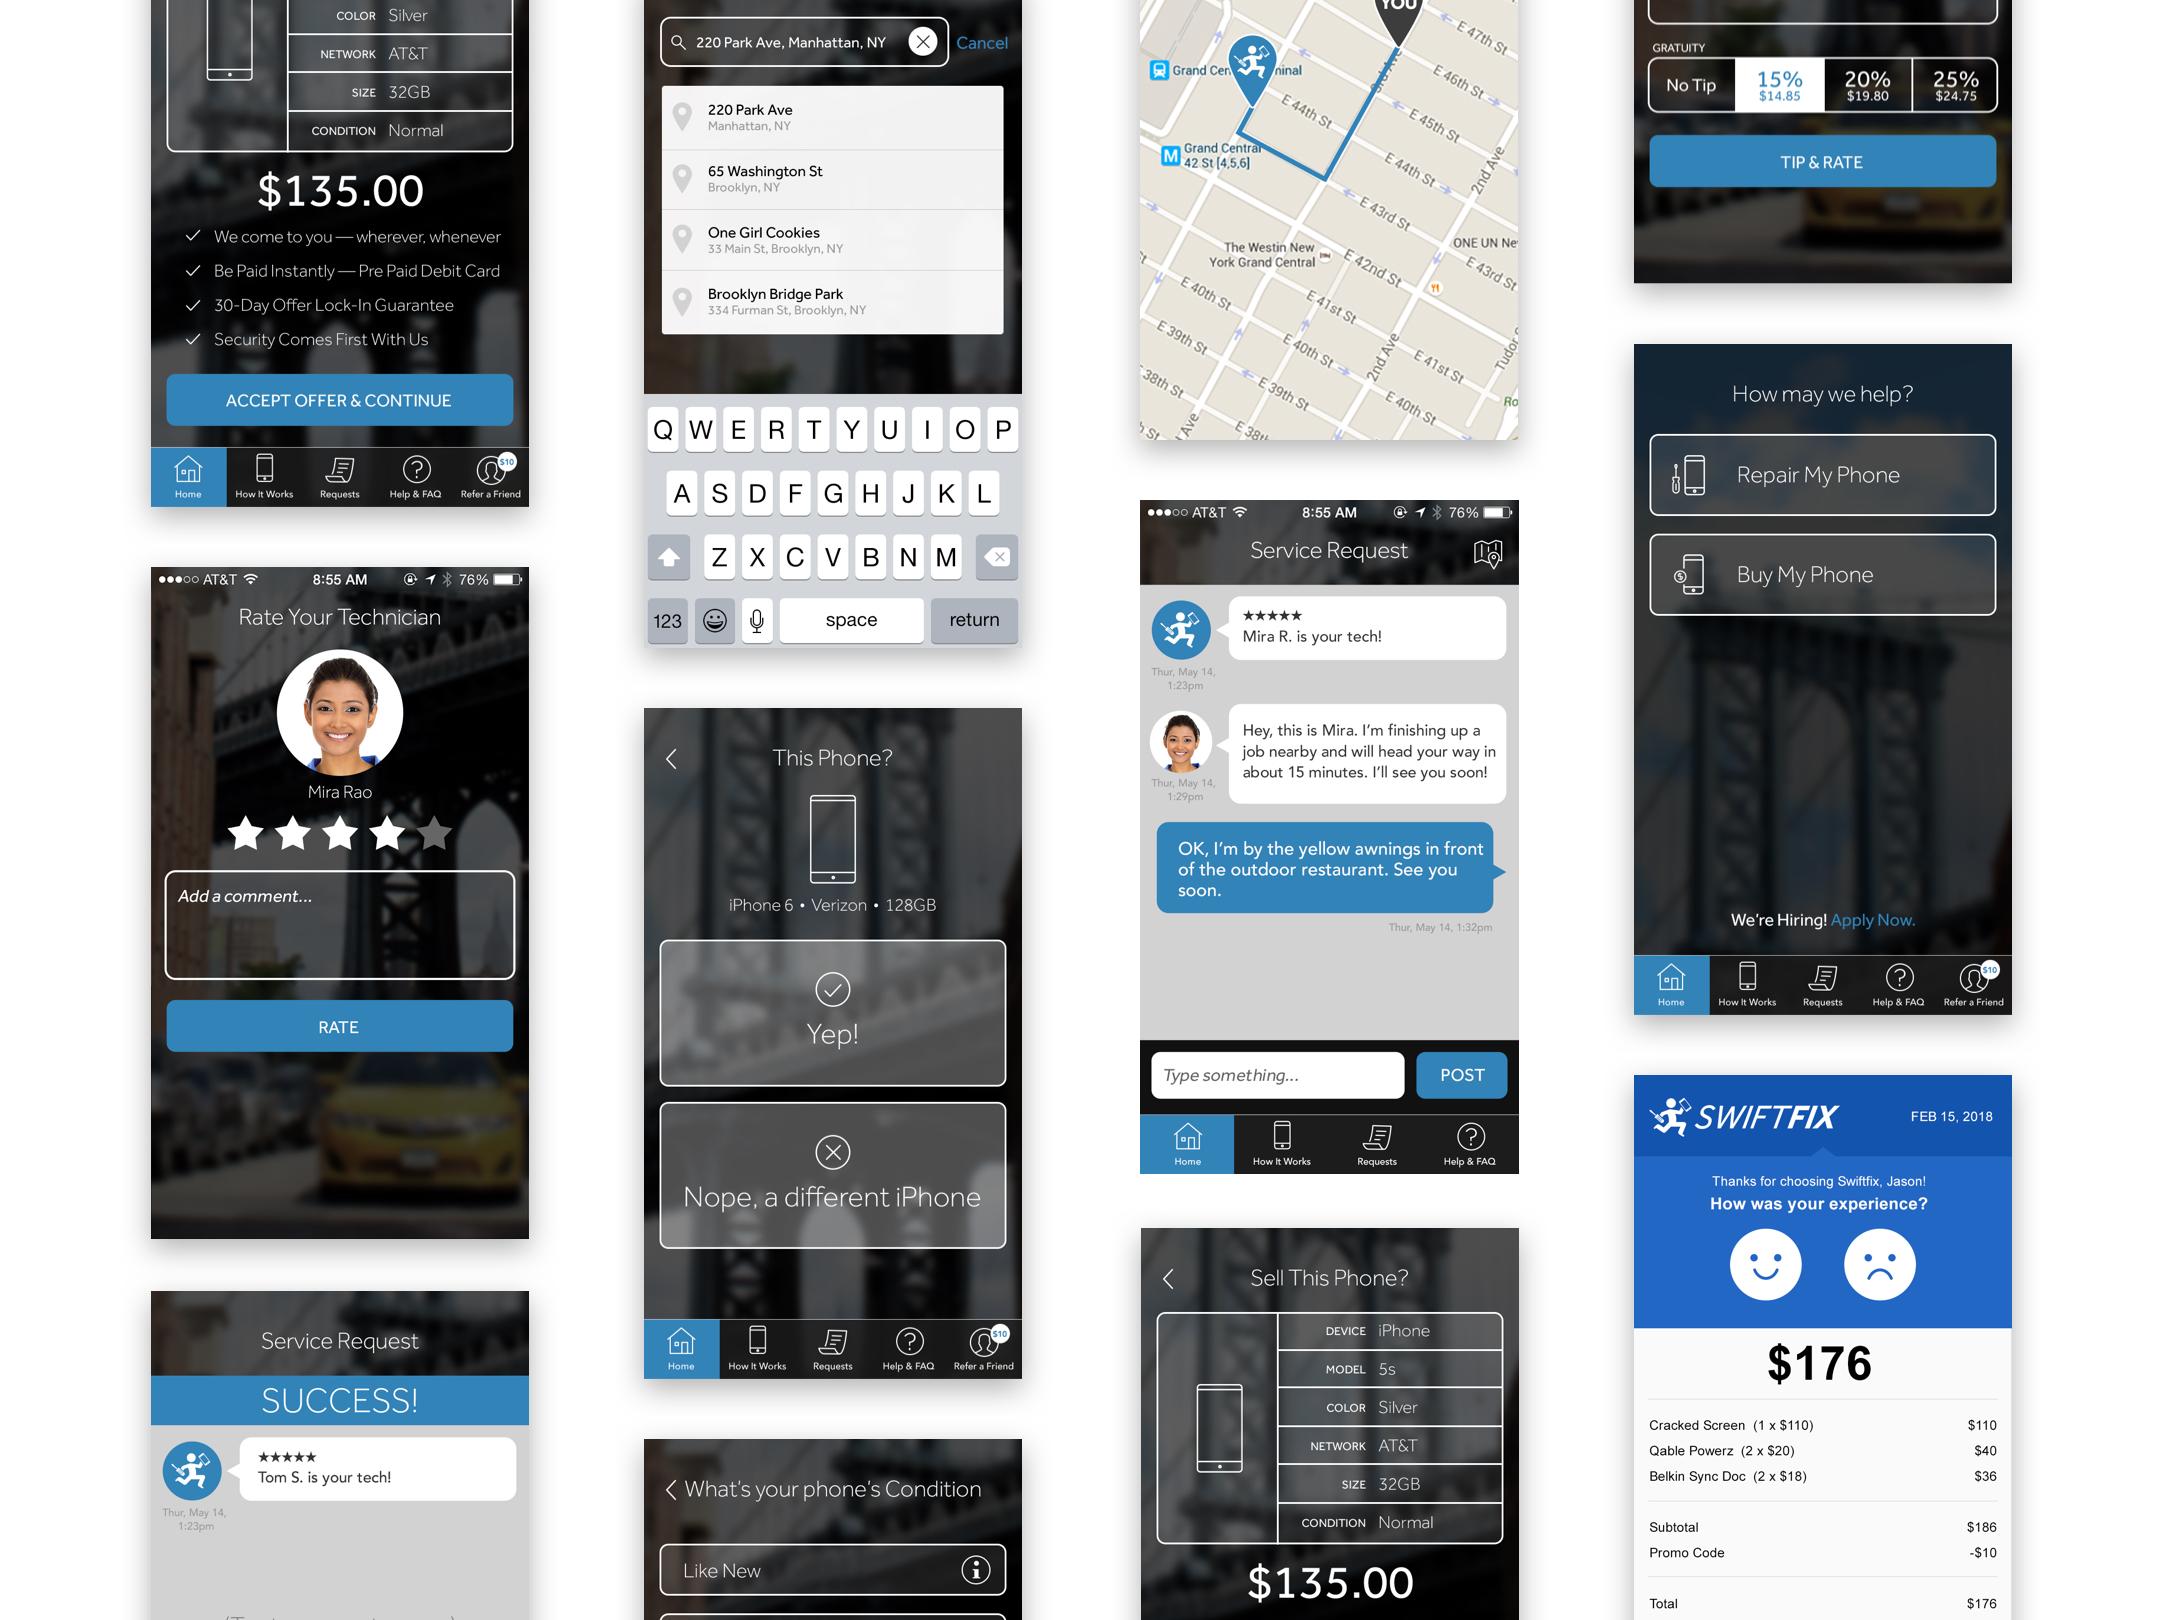 swiftfix-iphone-app-screens.jpg